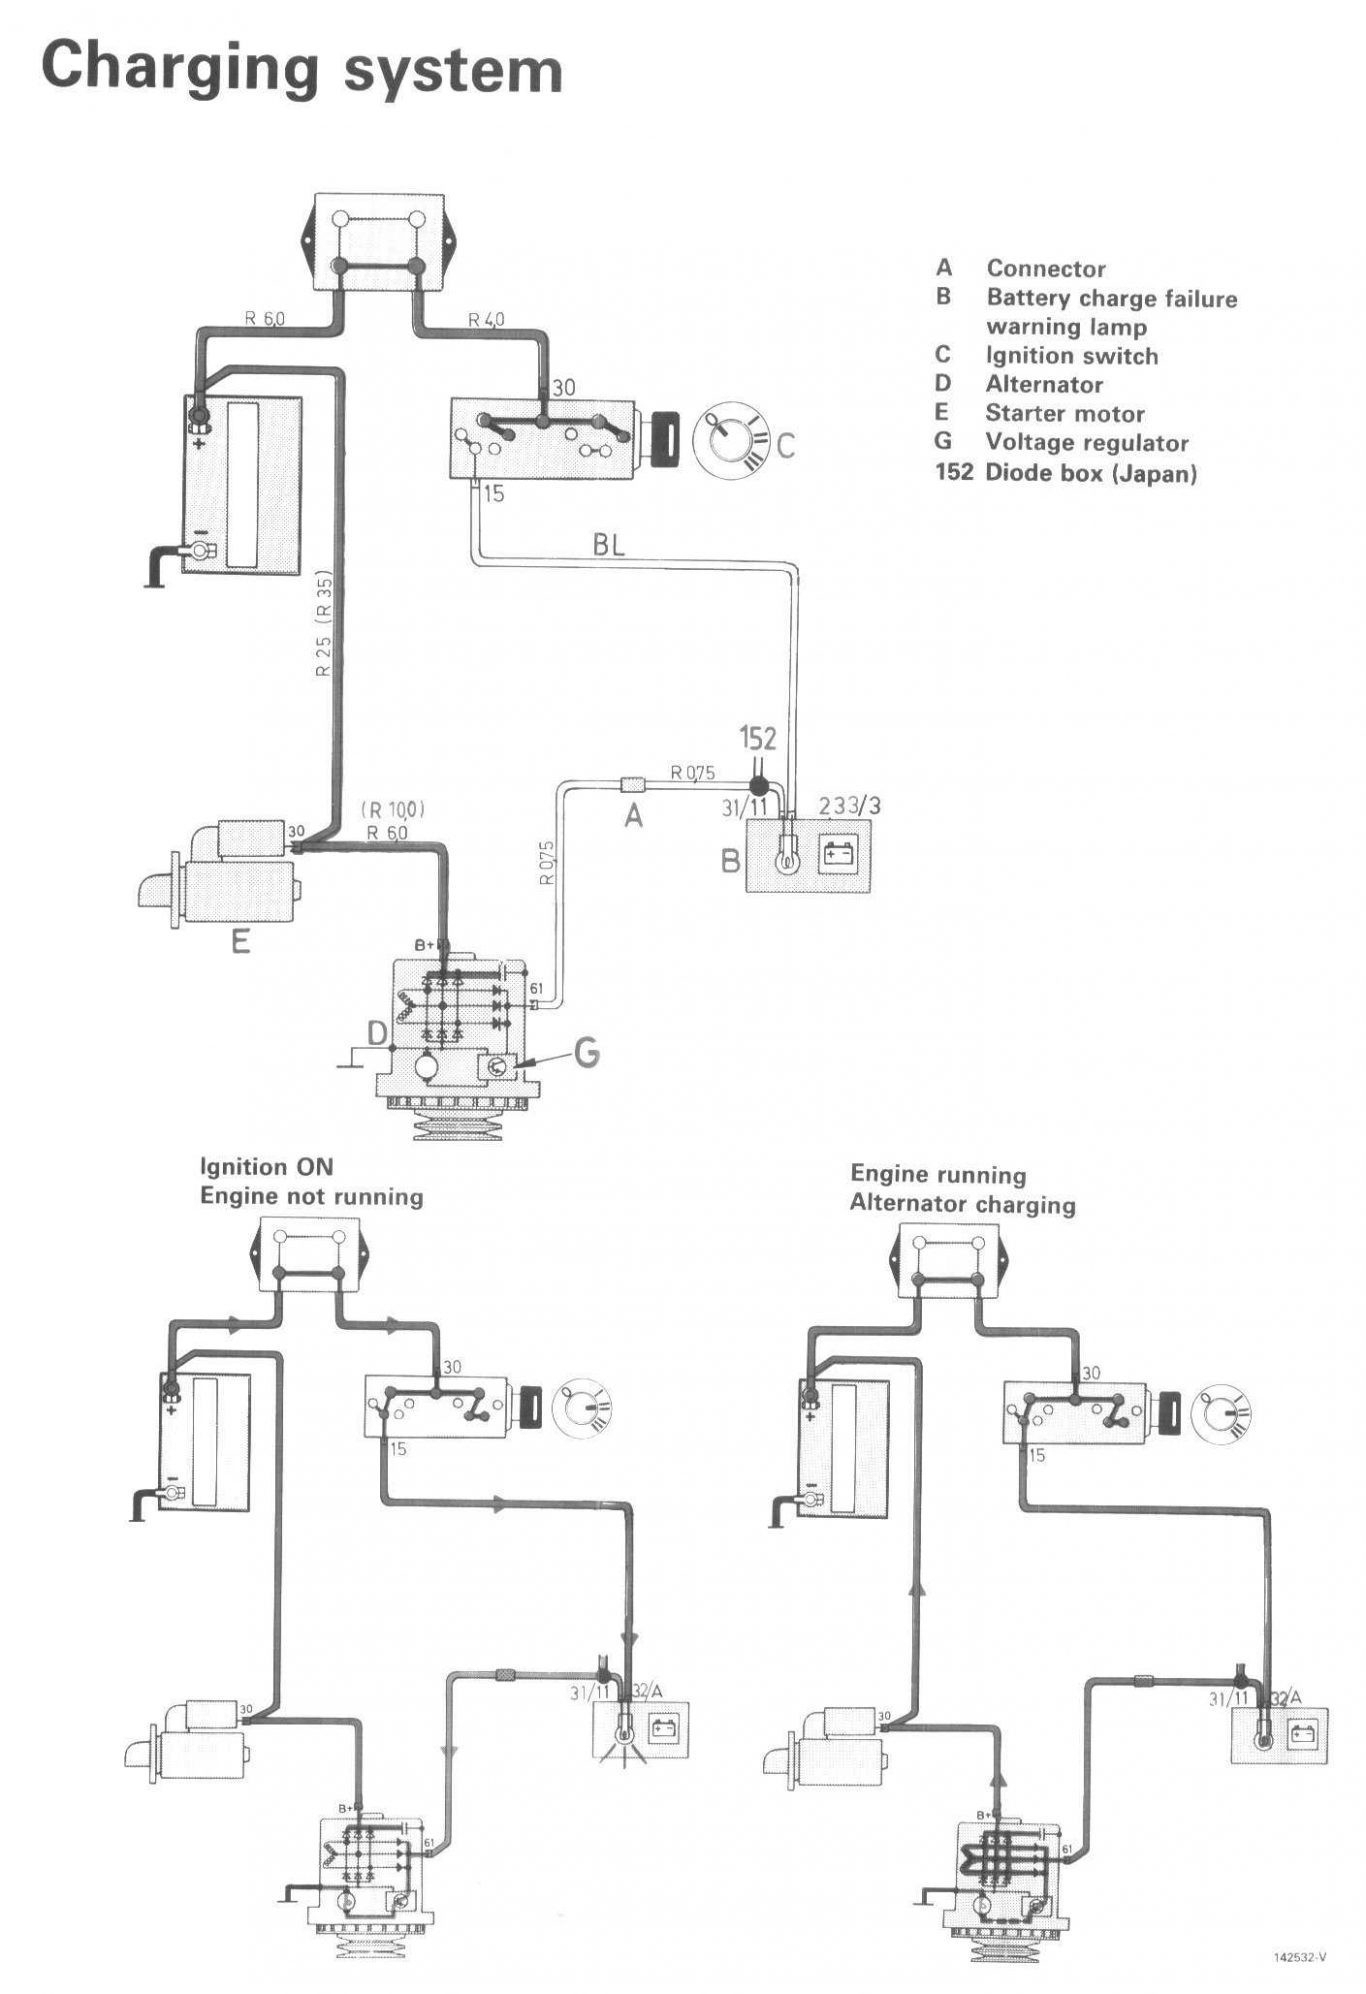 Ford One Wire Alternator Wiring Diagram | Free Wiring Diagram - One Wire Alternator Wiring Diagram Chevy